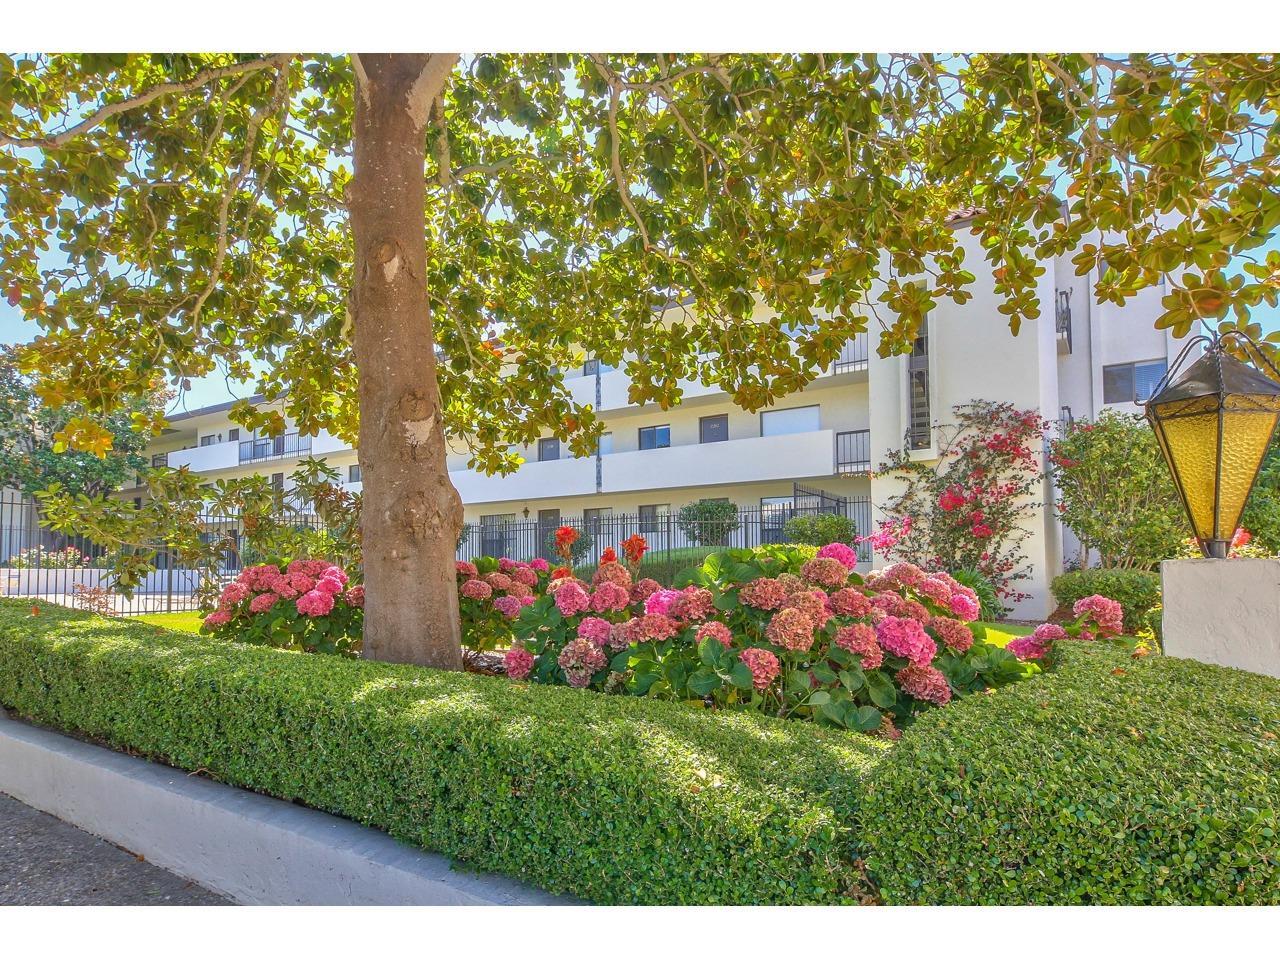 Photo of 500 Glenwood CIR 218, MONTEREY, CA 93940